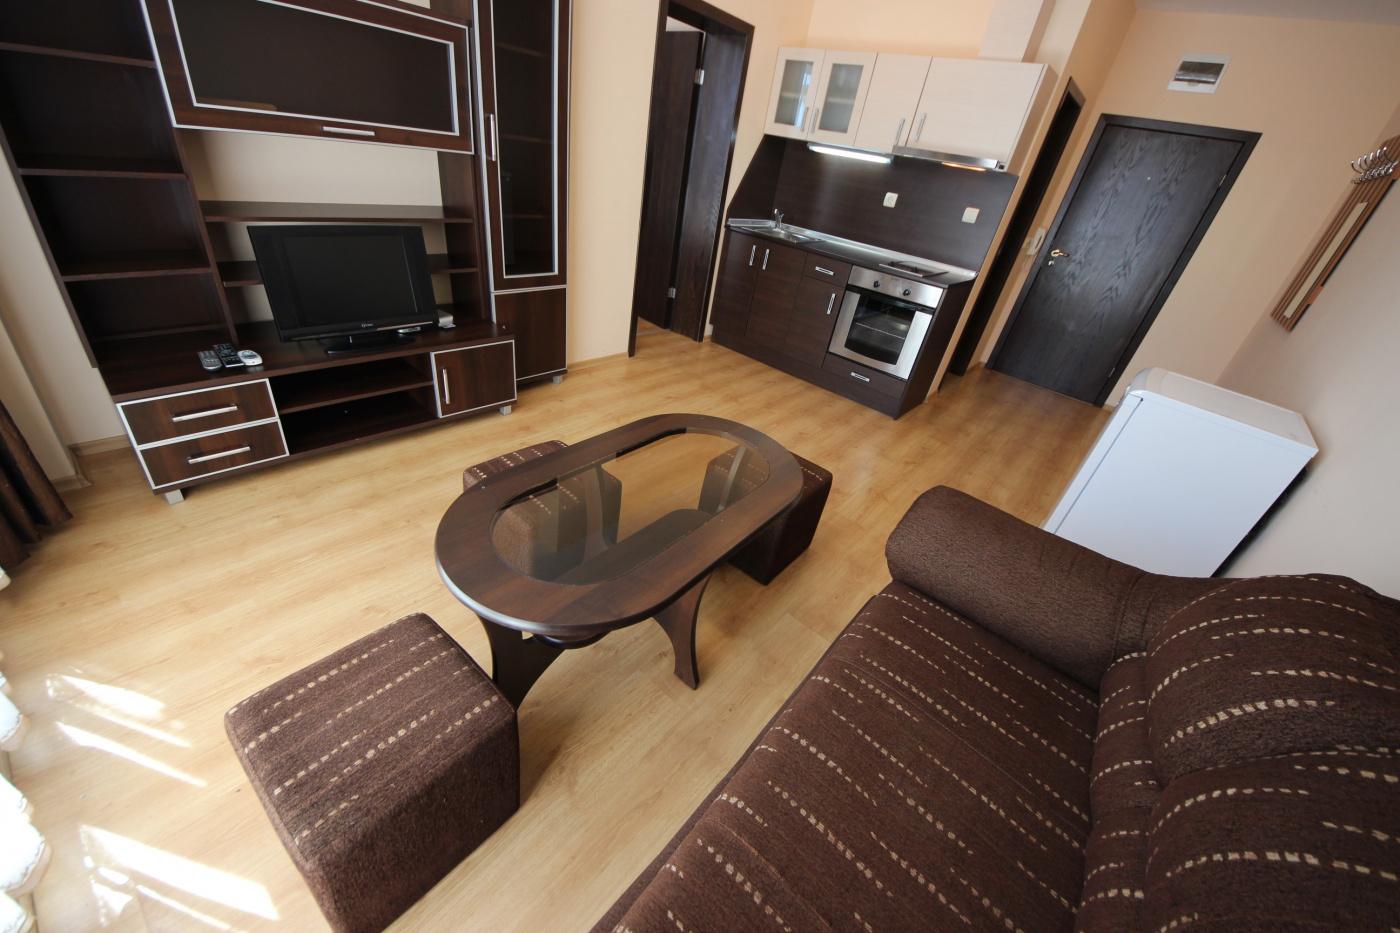 Luxor apartament A 4.8